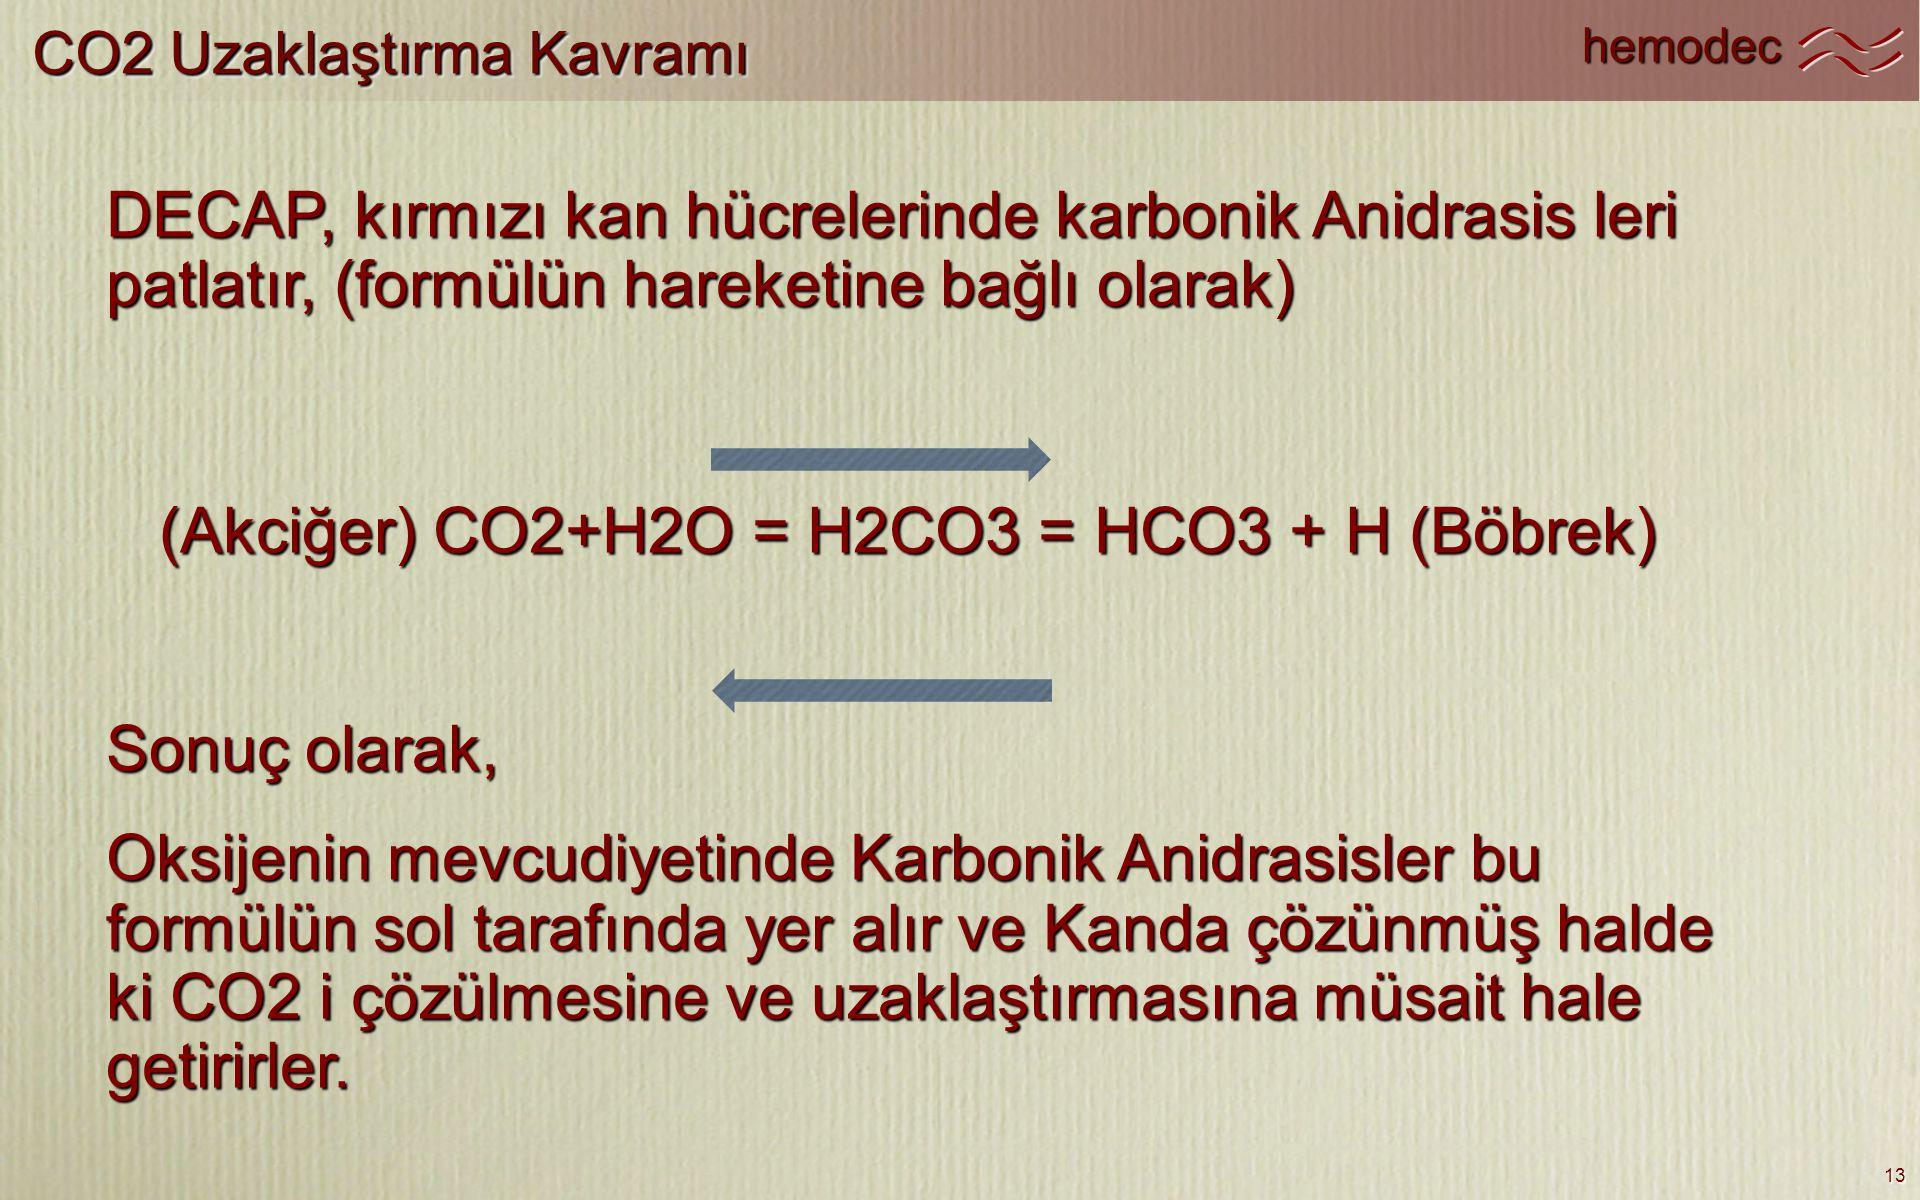 (Akciğer) CO2+H2O = H2CO3 = HCO3 + H (Böbrek)